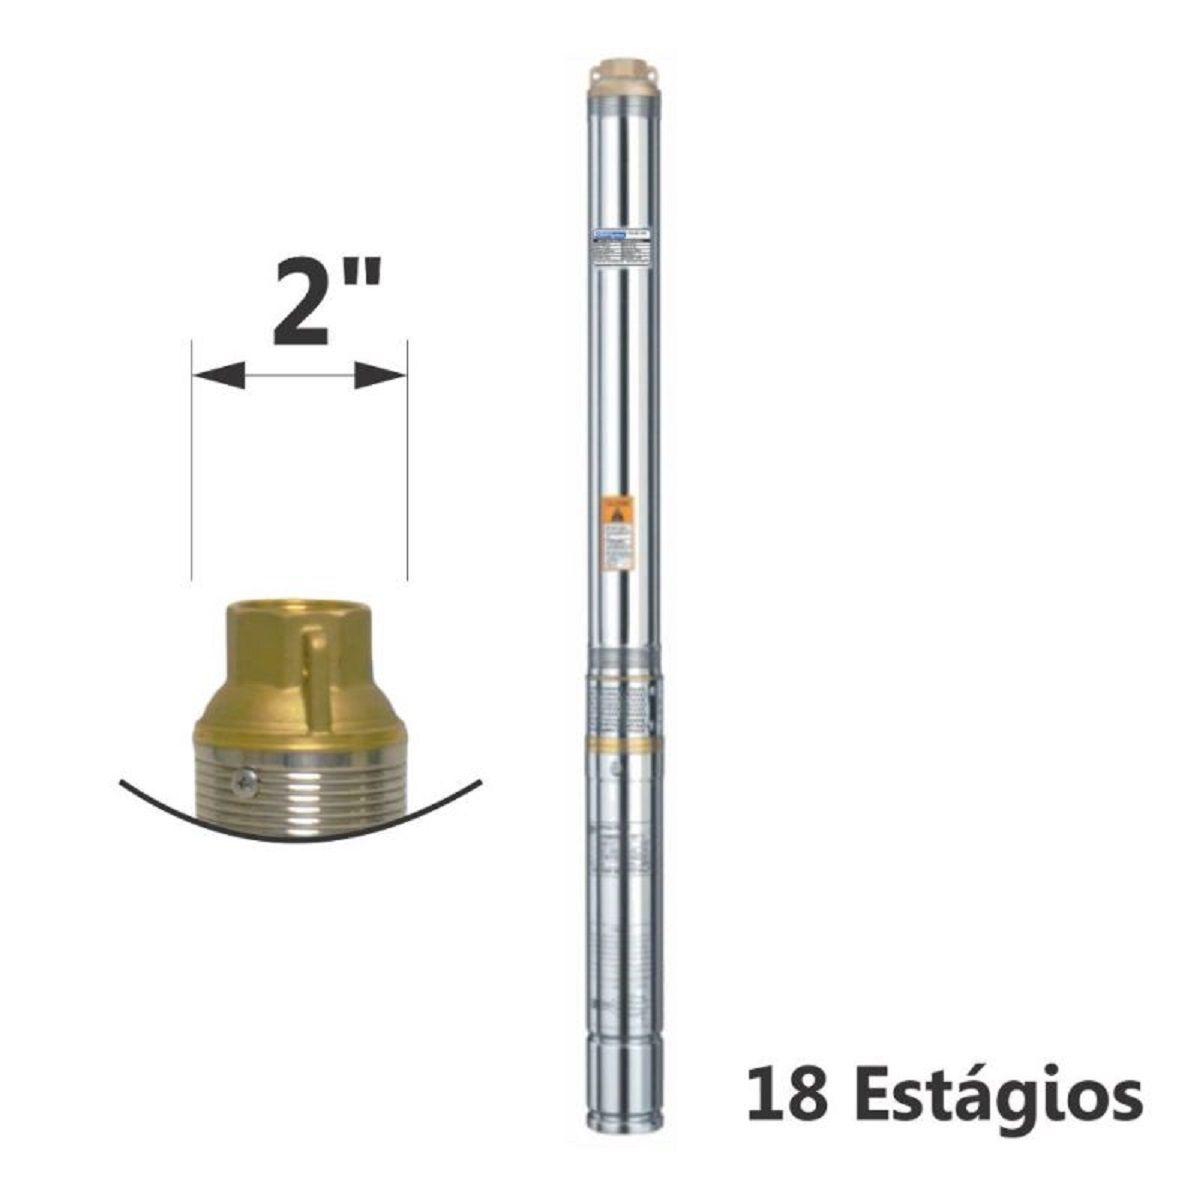 Motobomba Submersa Caneta Inox 1/3Cv Mono 220V ESUB-2/18S Eletroplas